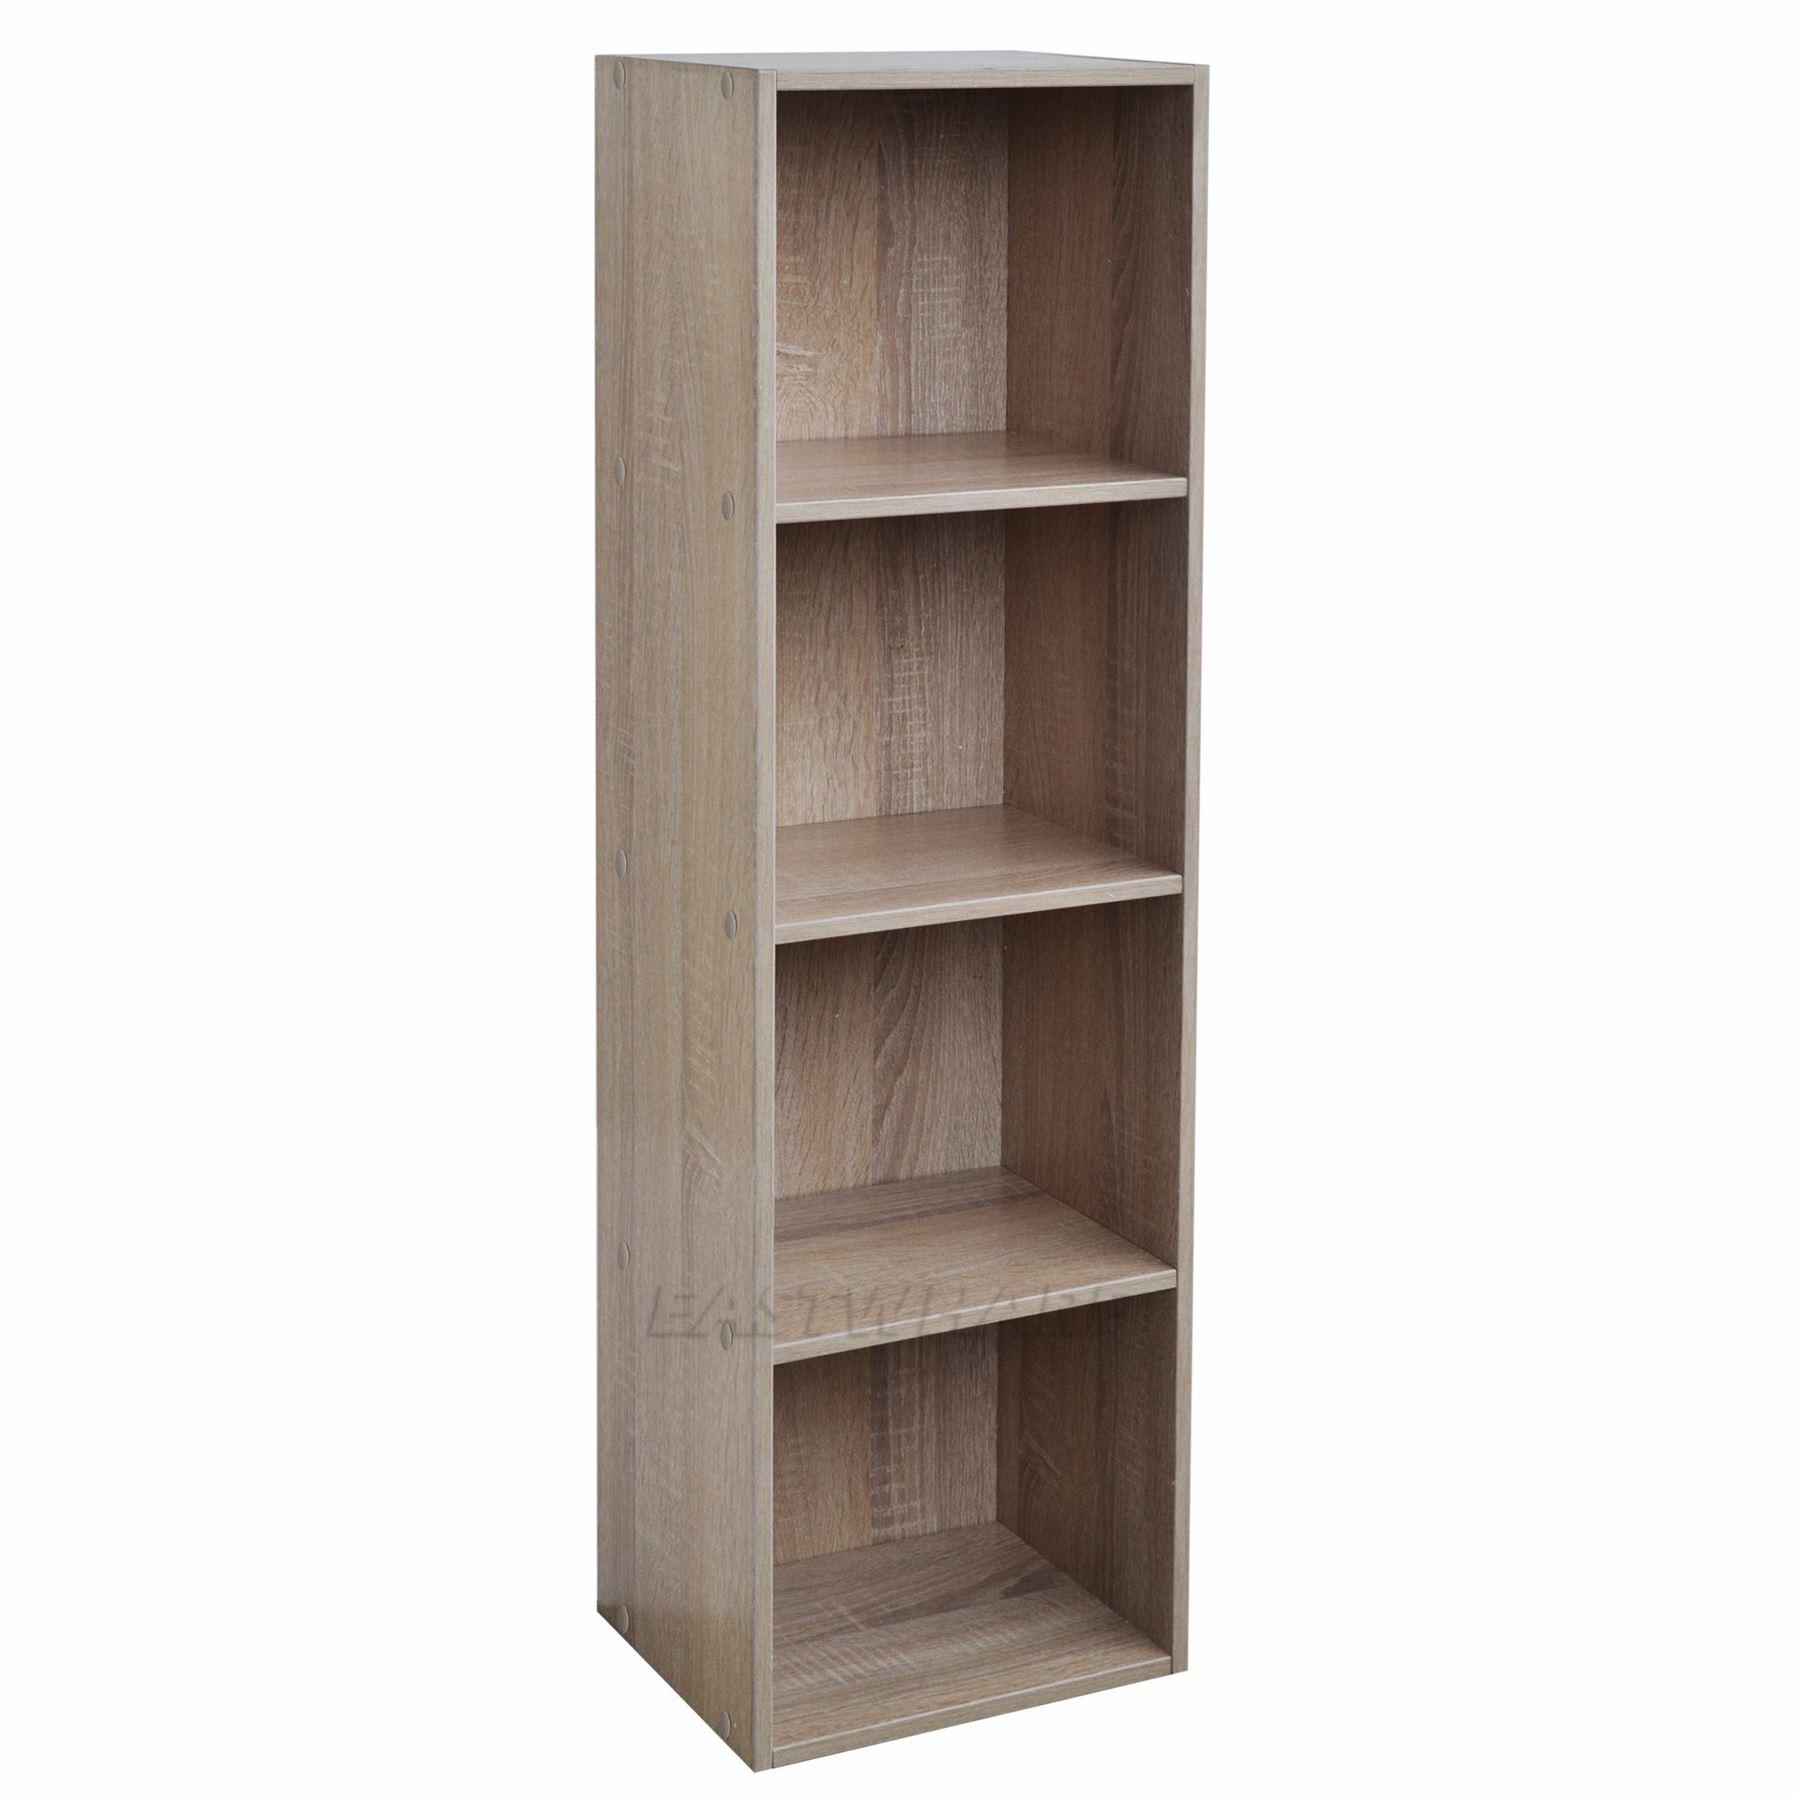 Wooden Bookcase Shelving Display Storage Wood Shelf Shelves Units Multiple Tiers | eBay